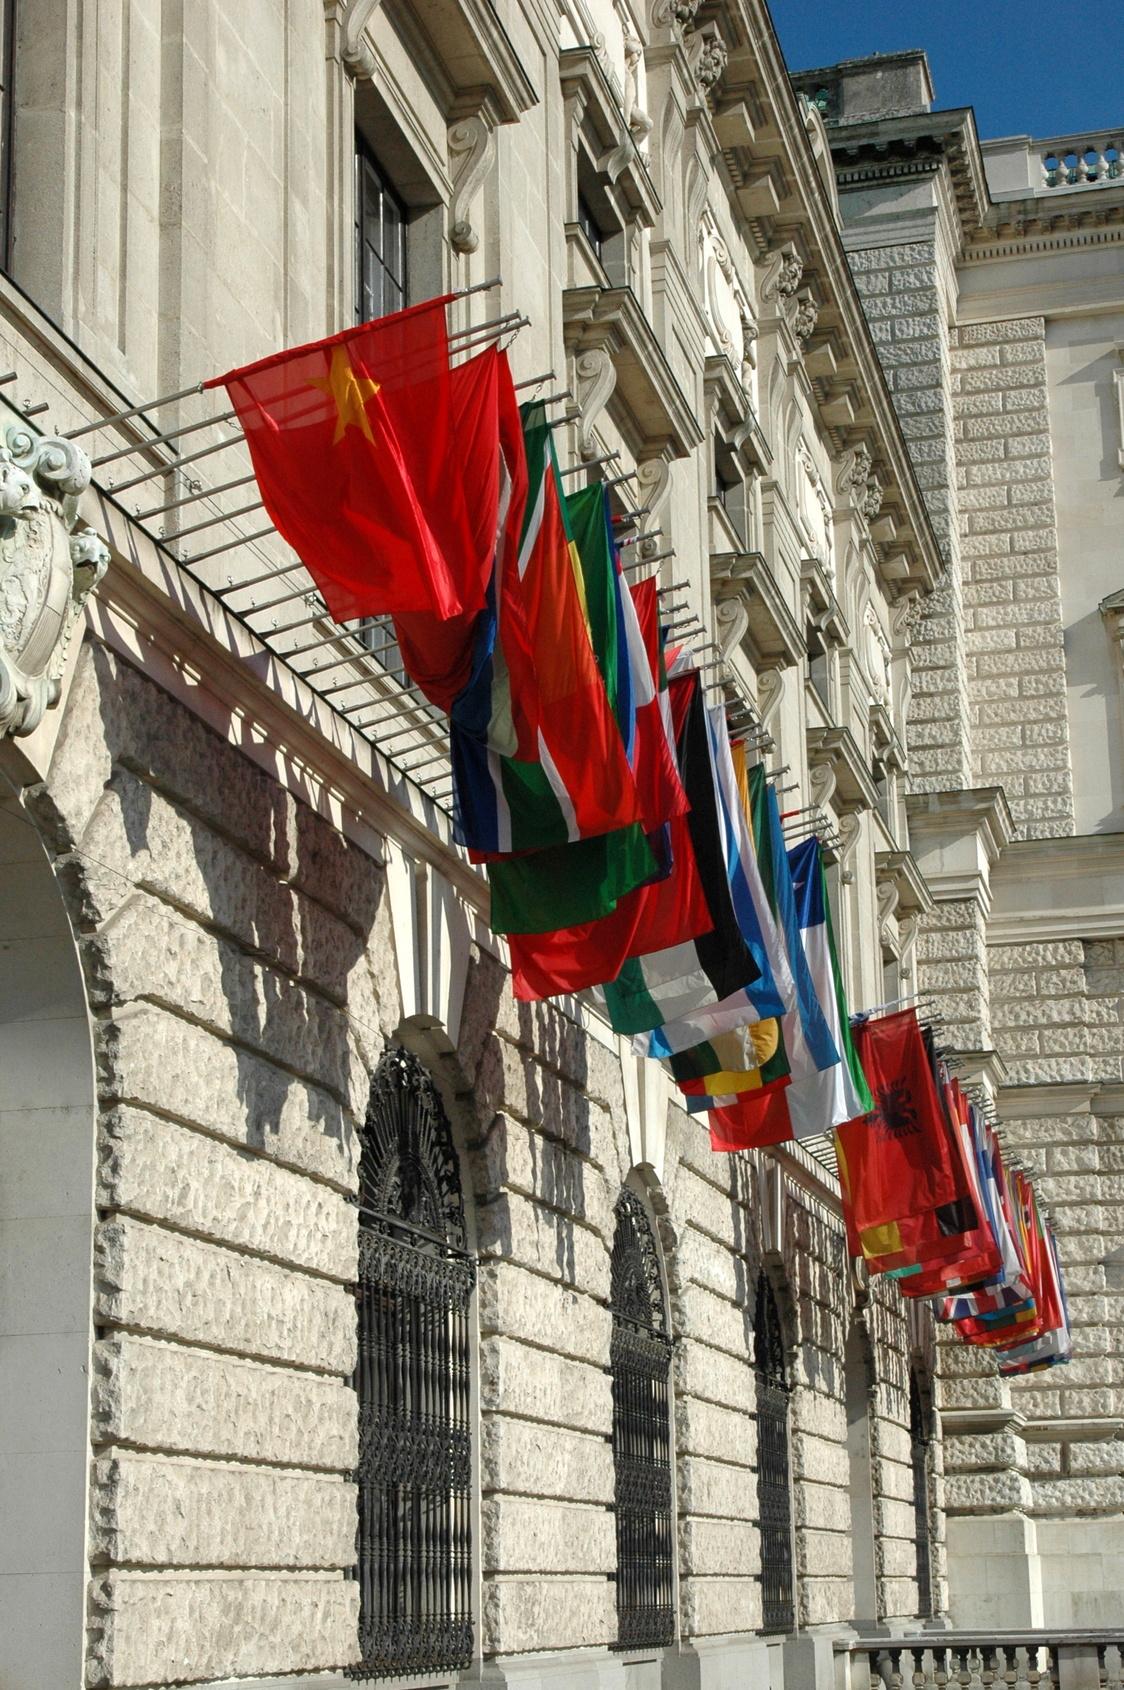 flagi na zamówienie, flagi produkcja, flagi,flagi producent, flagi reklamowe,flagi firmowe